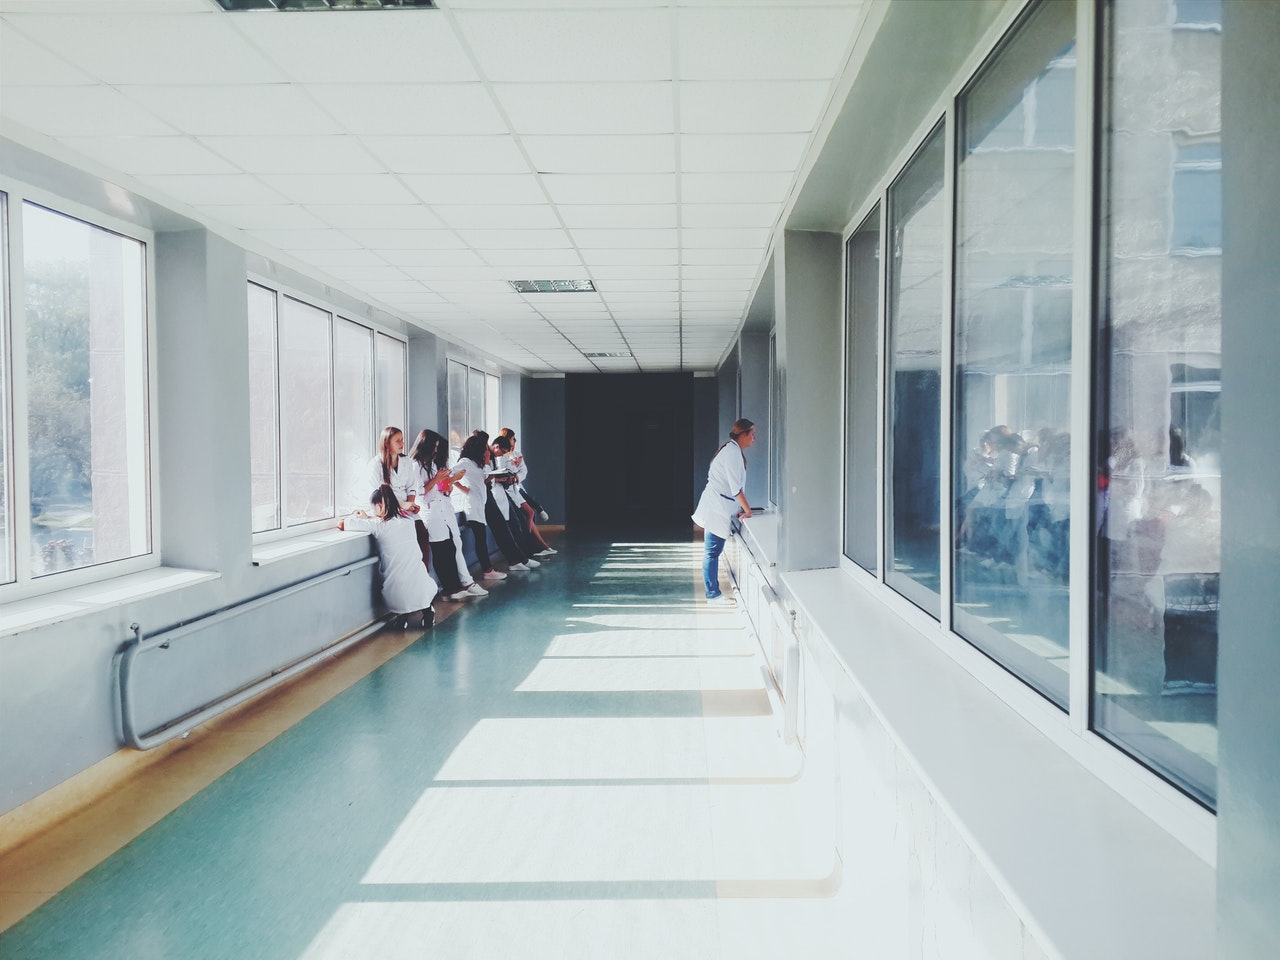 hospital preparedness tool